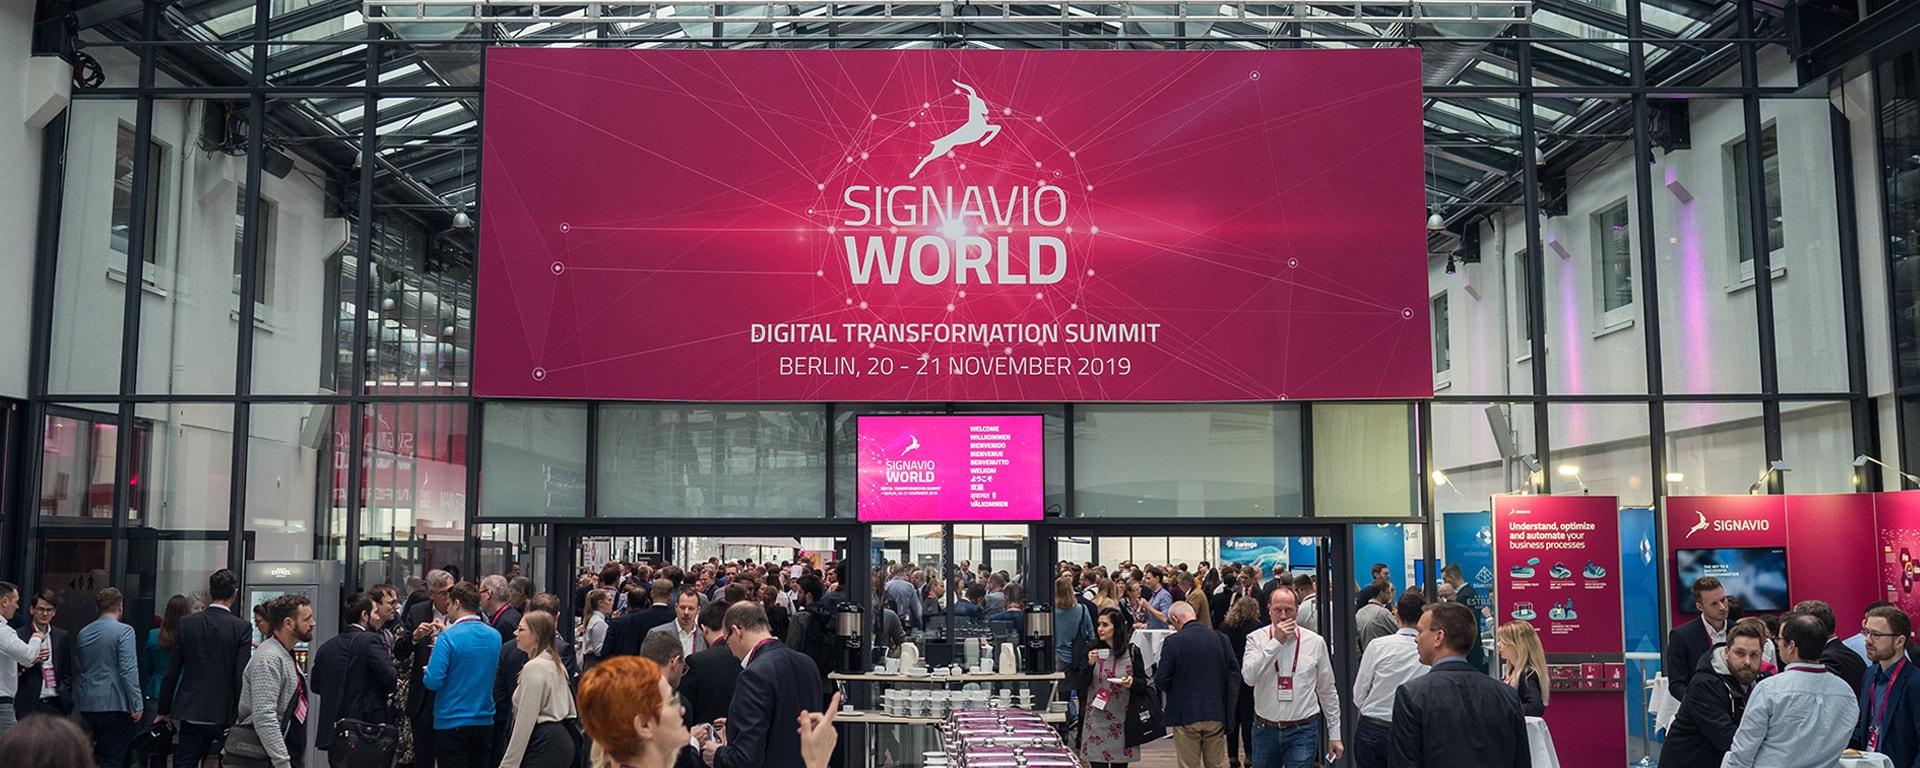 Signavio World 2019 entrance hall with sign